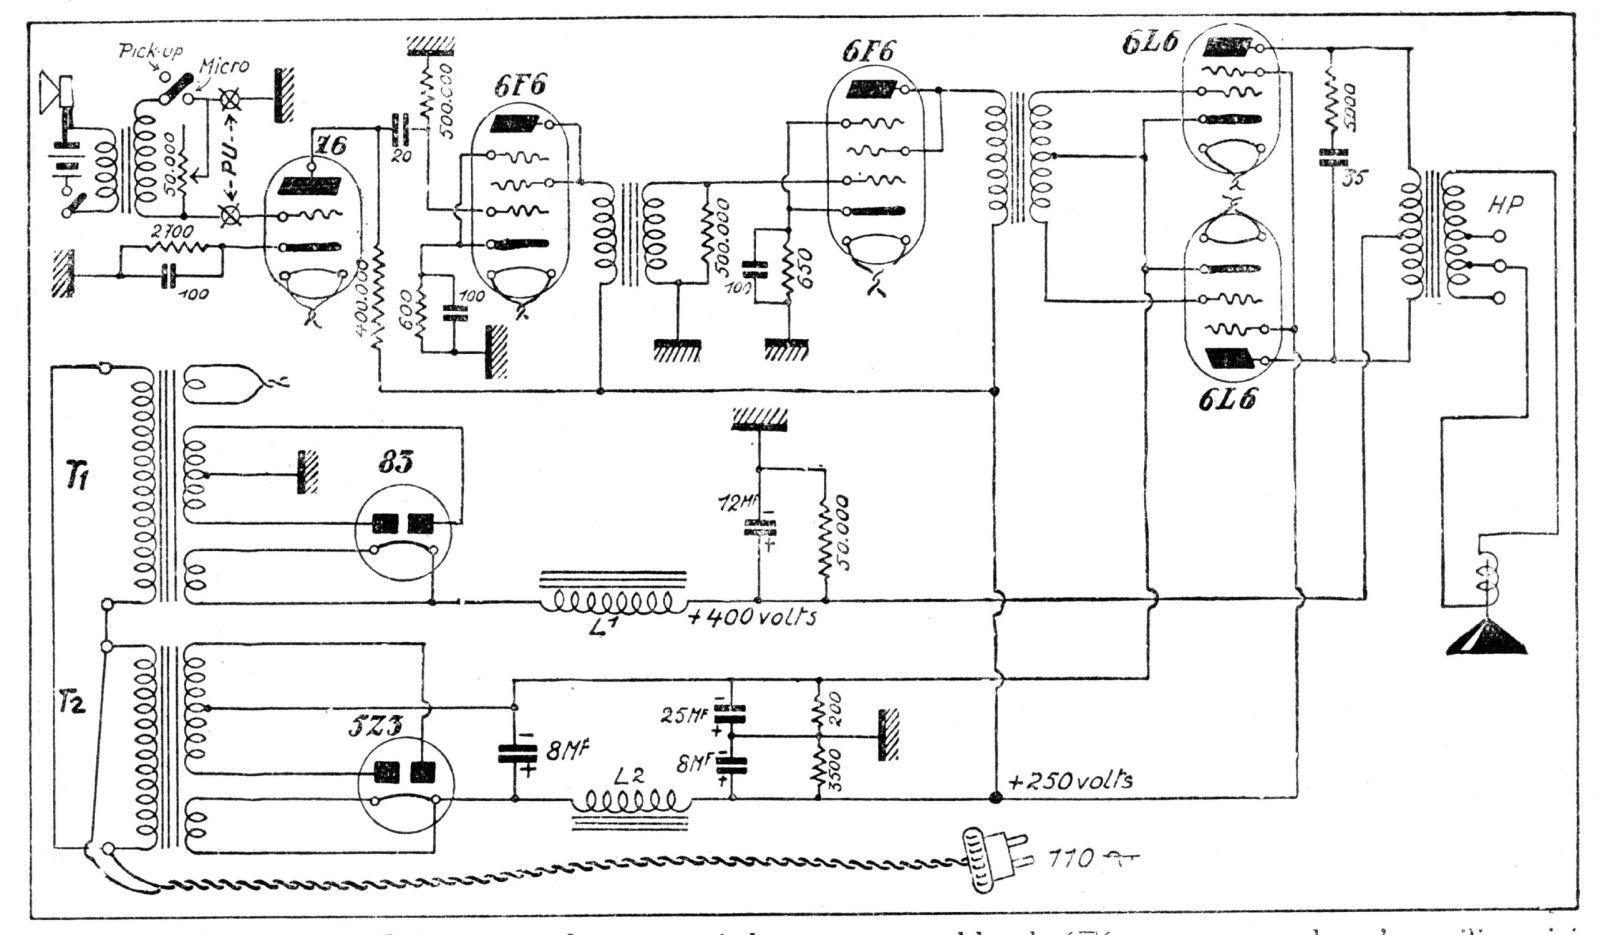 Se Tube Amplifier 6l6 Schematic